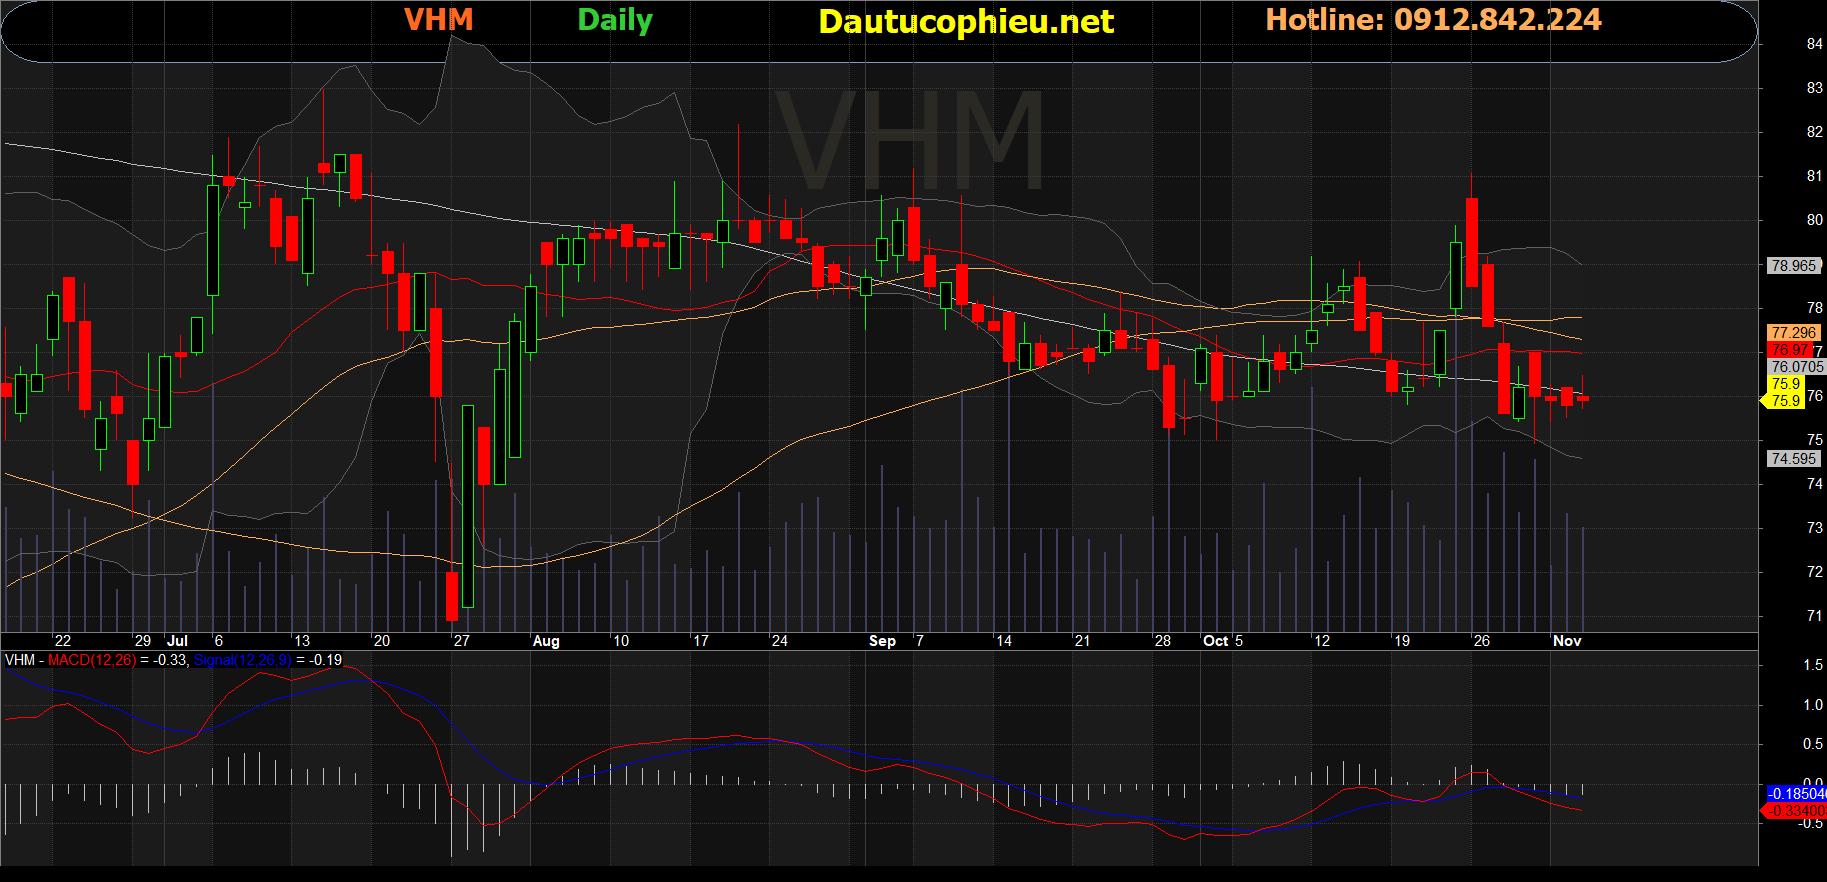 Cổ phiếu VHM